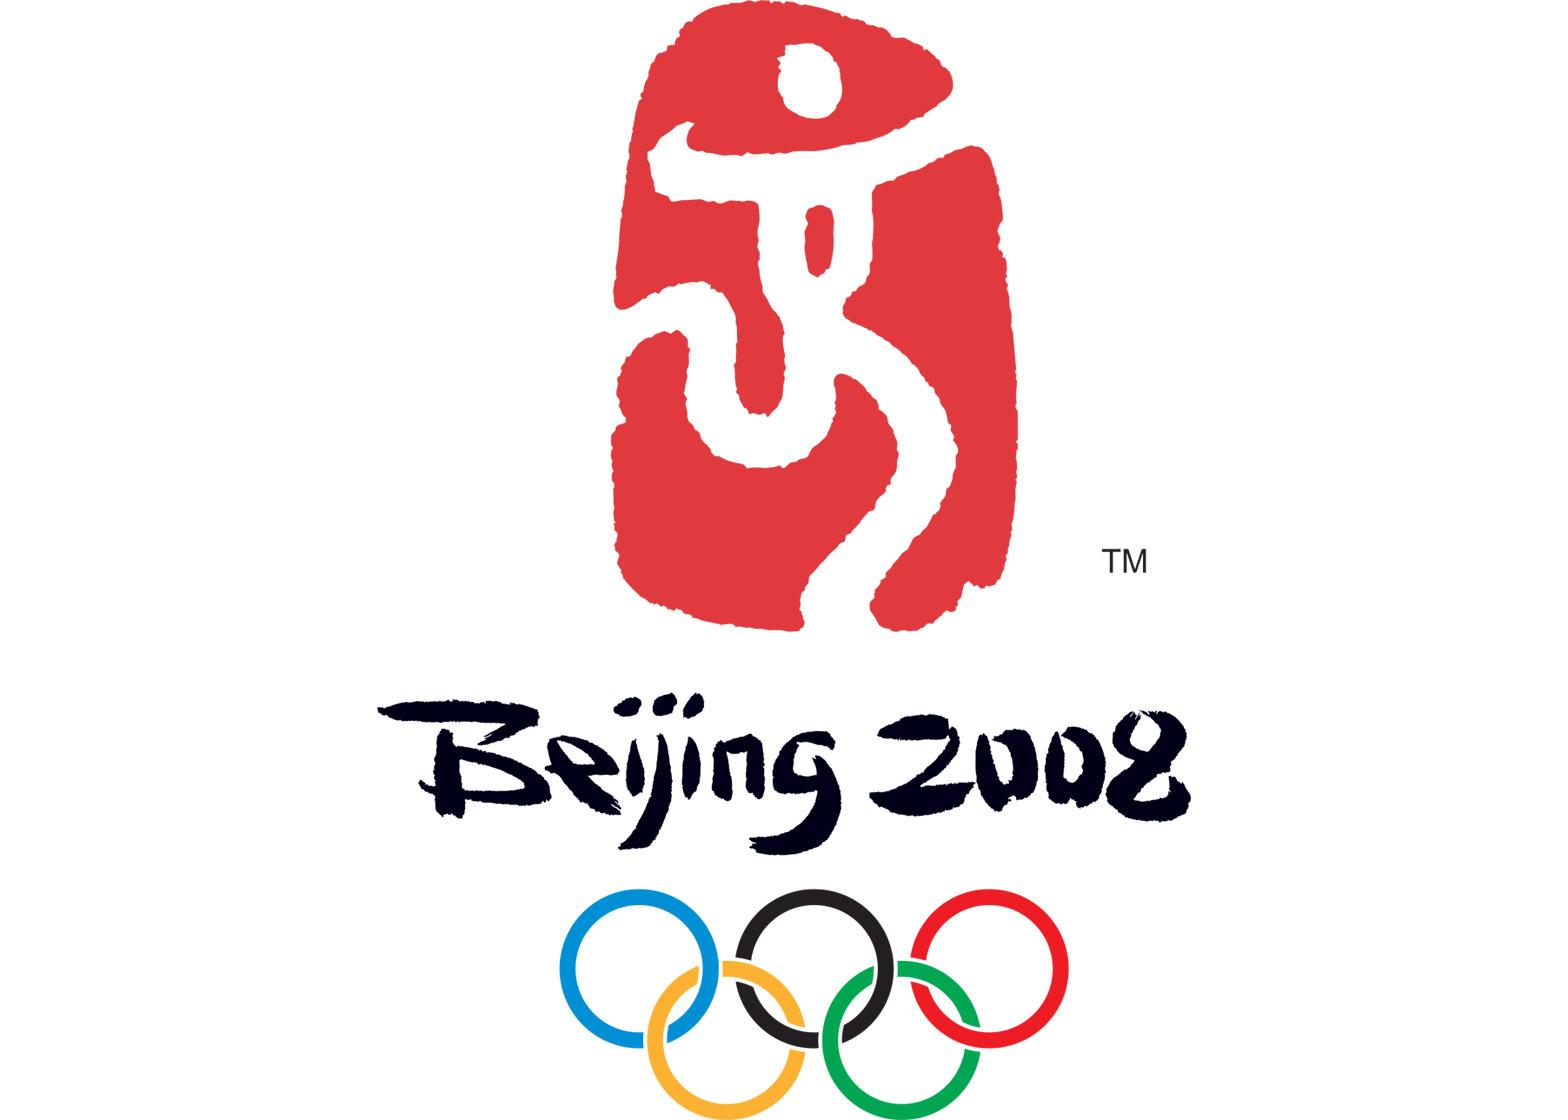 Logo of the 2008 Beijing Olympics